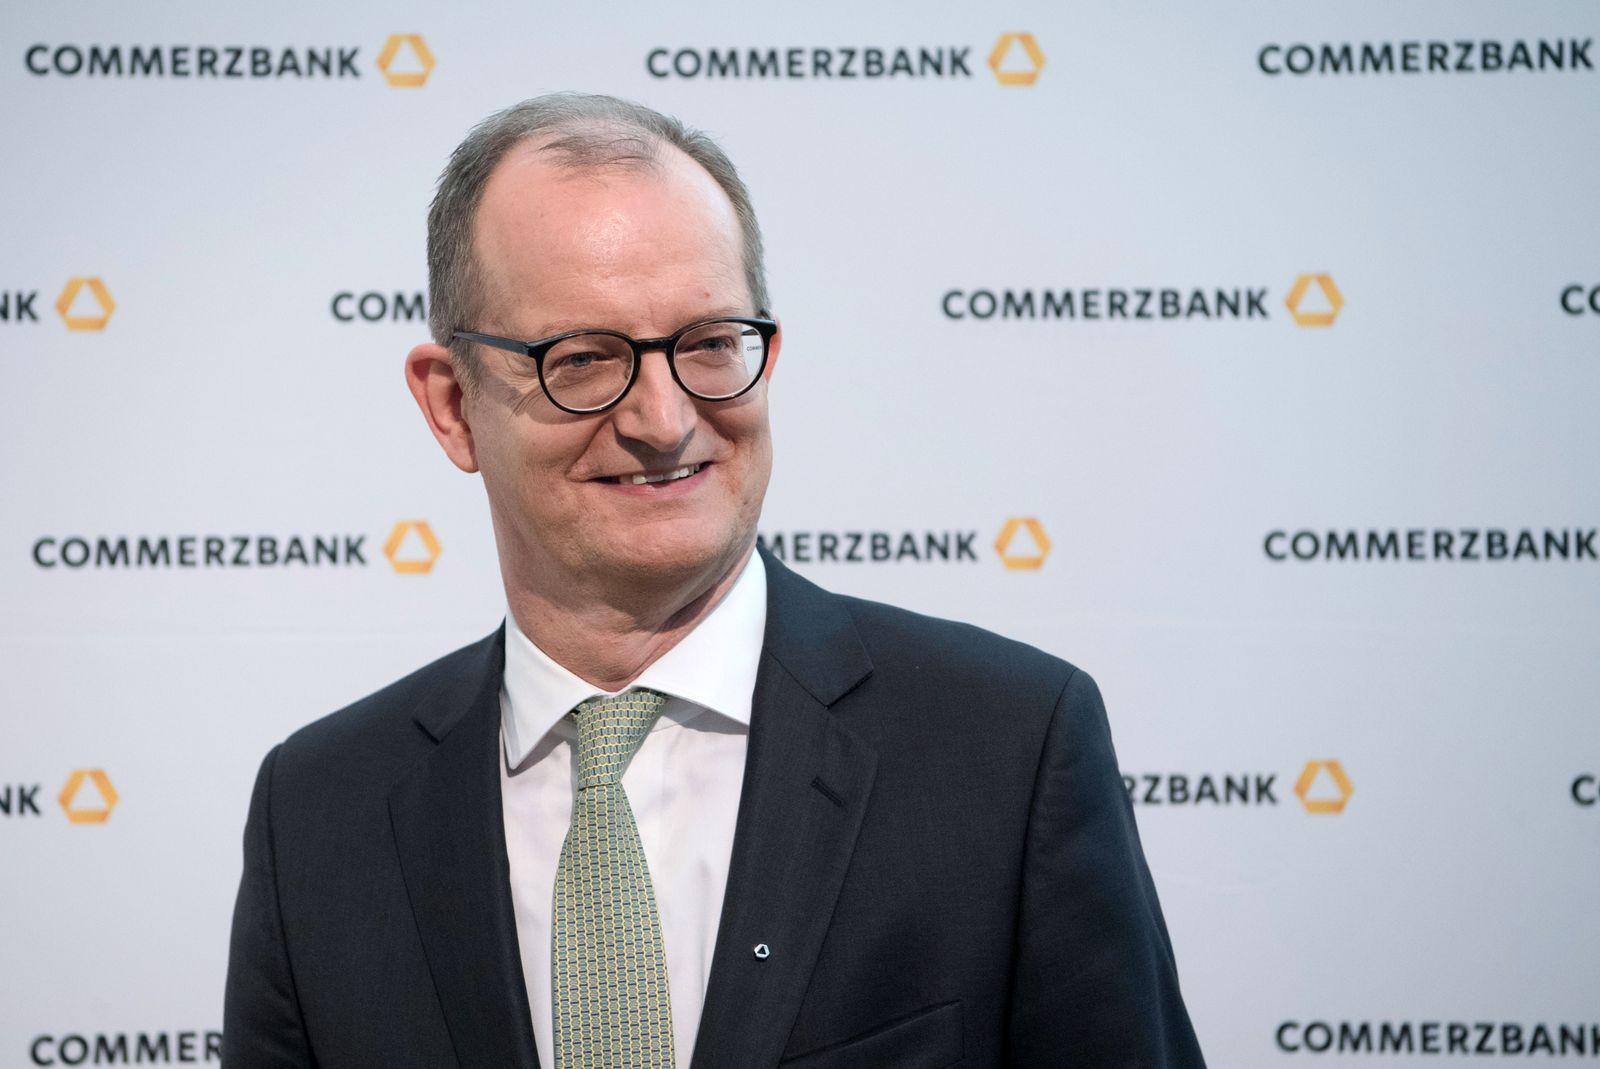 Führung Deutsche Bank / Commerzbank / Martin Zielke